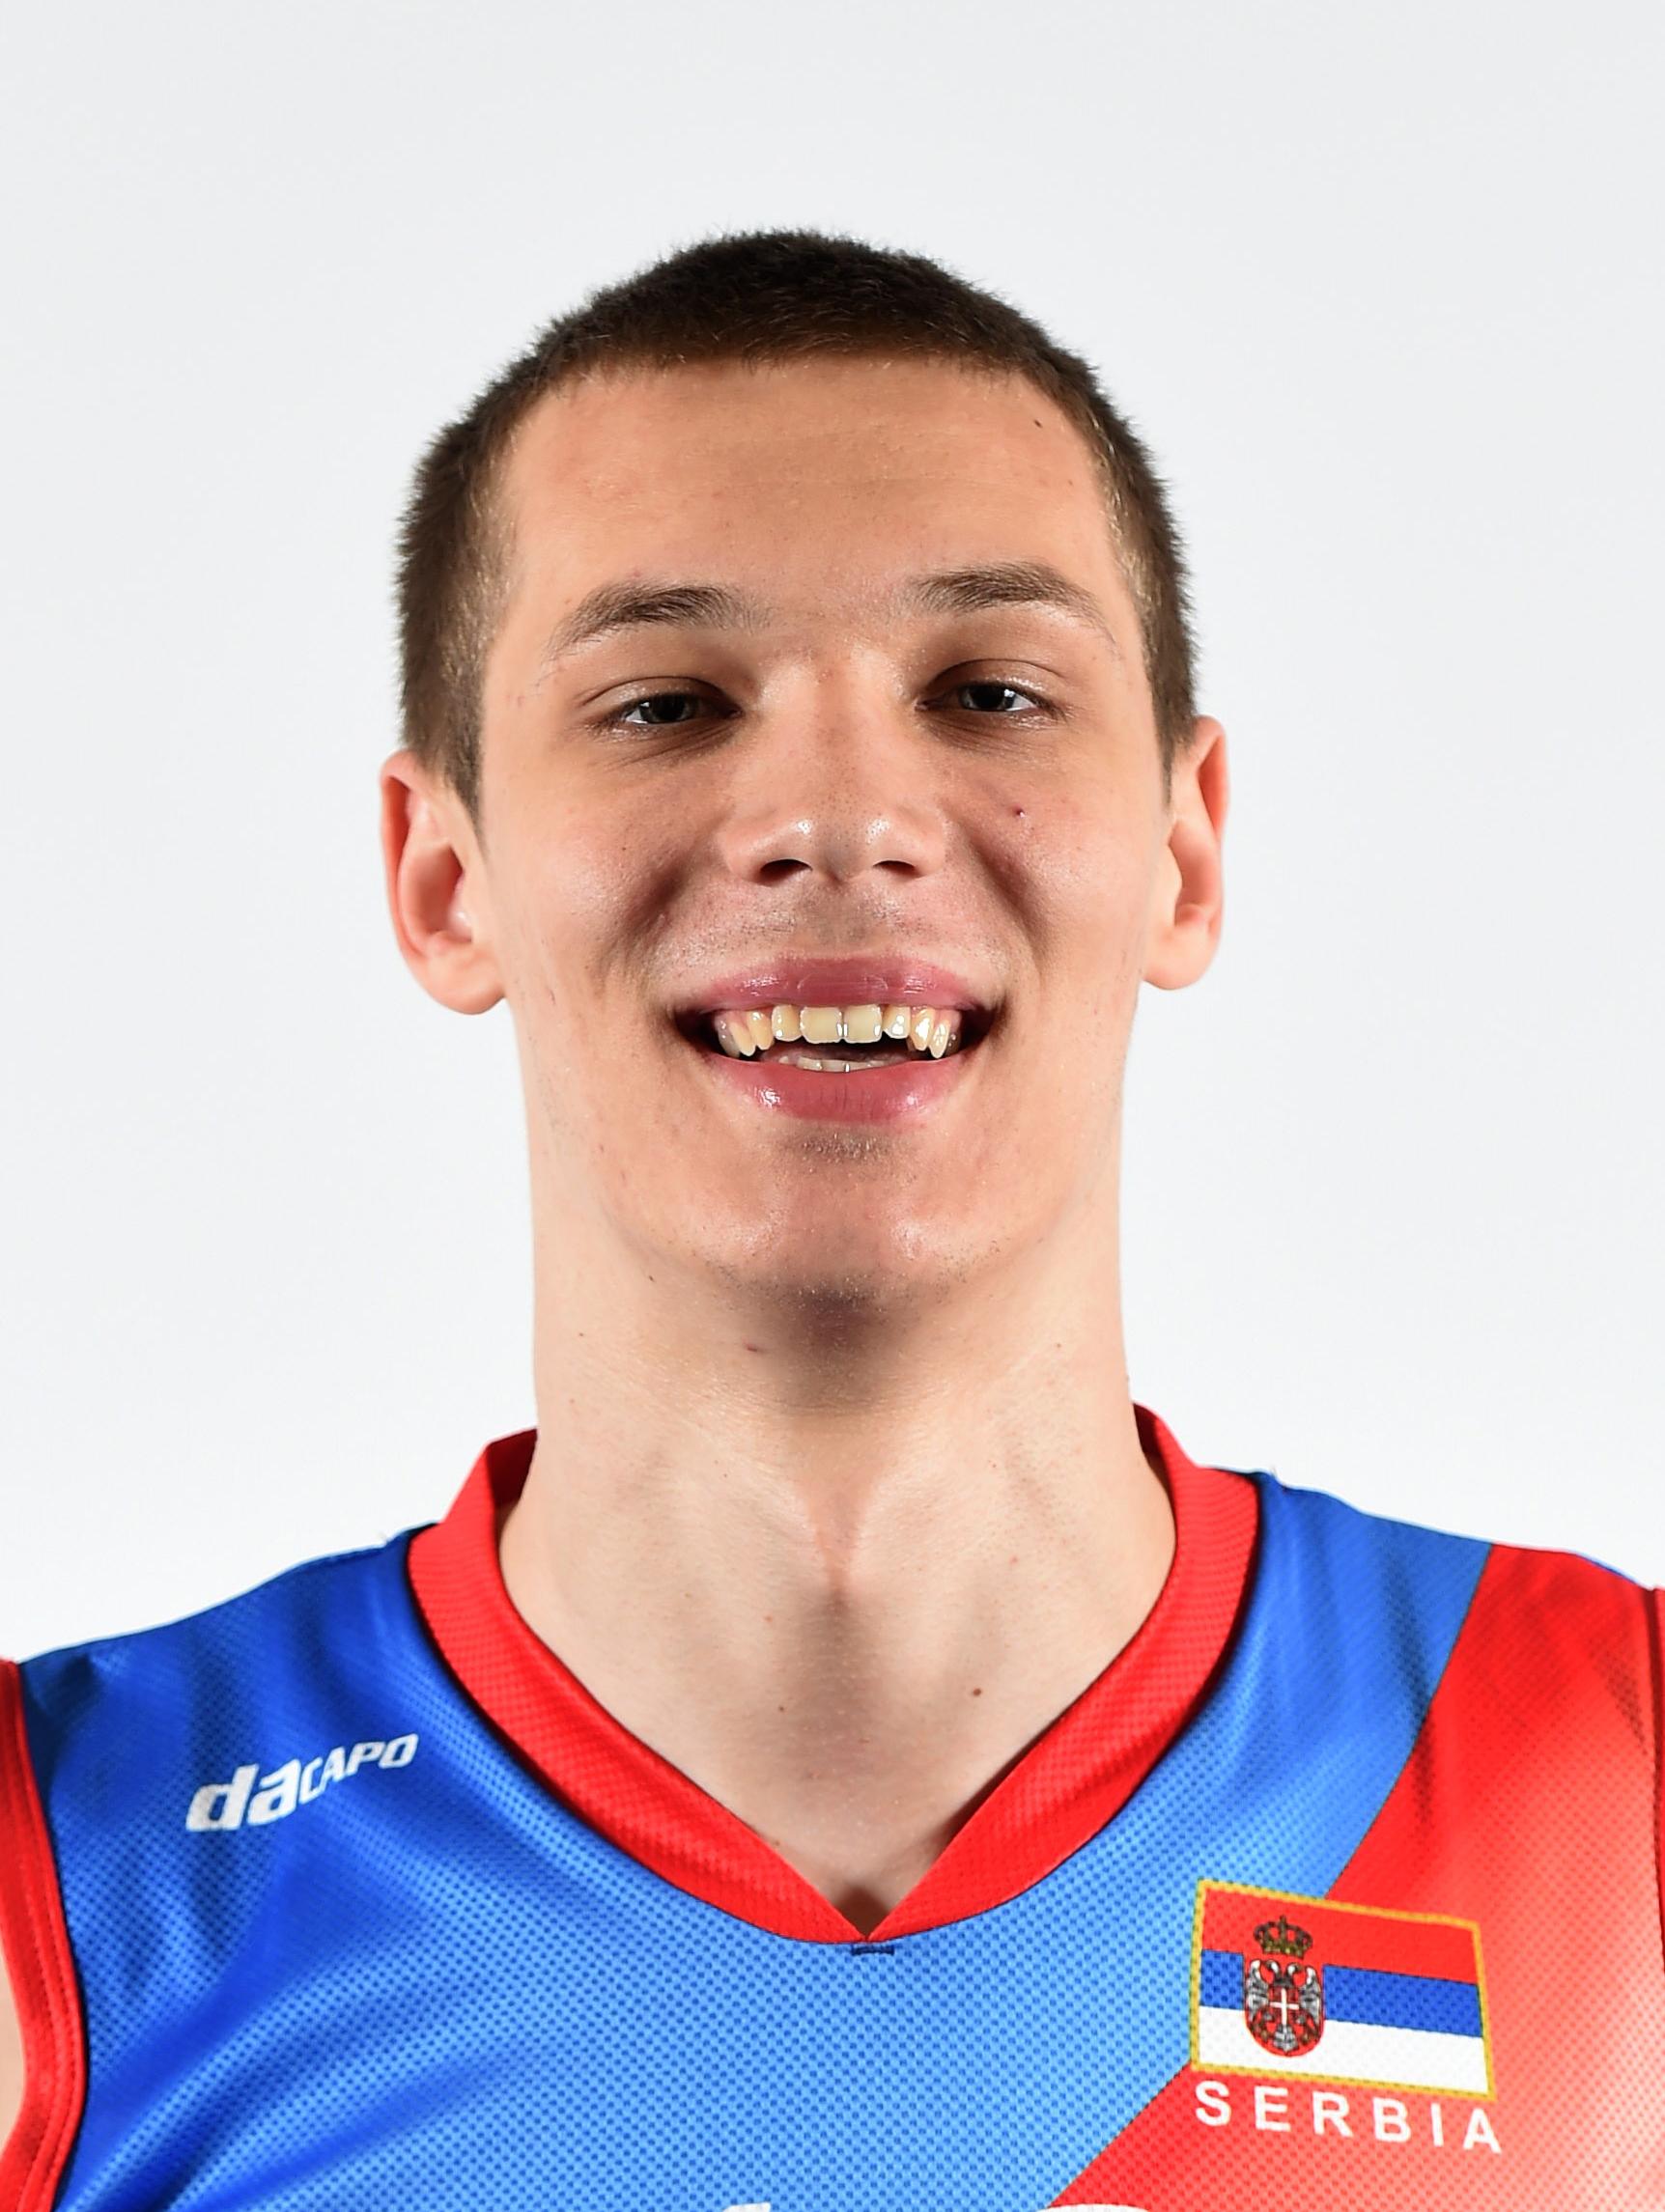 Aleksa Brdjovic